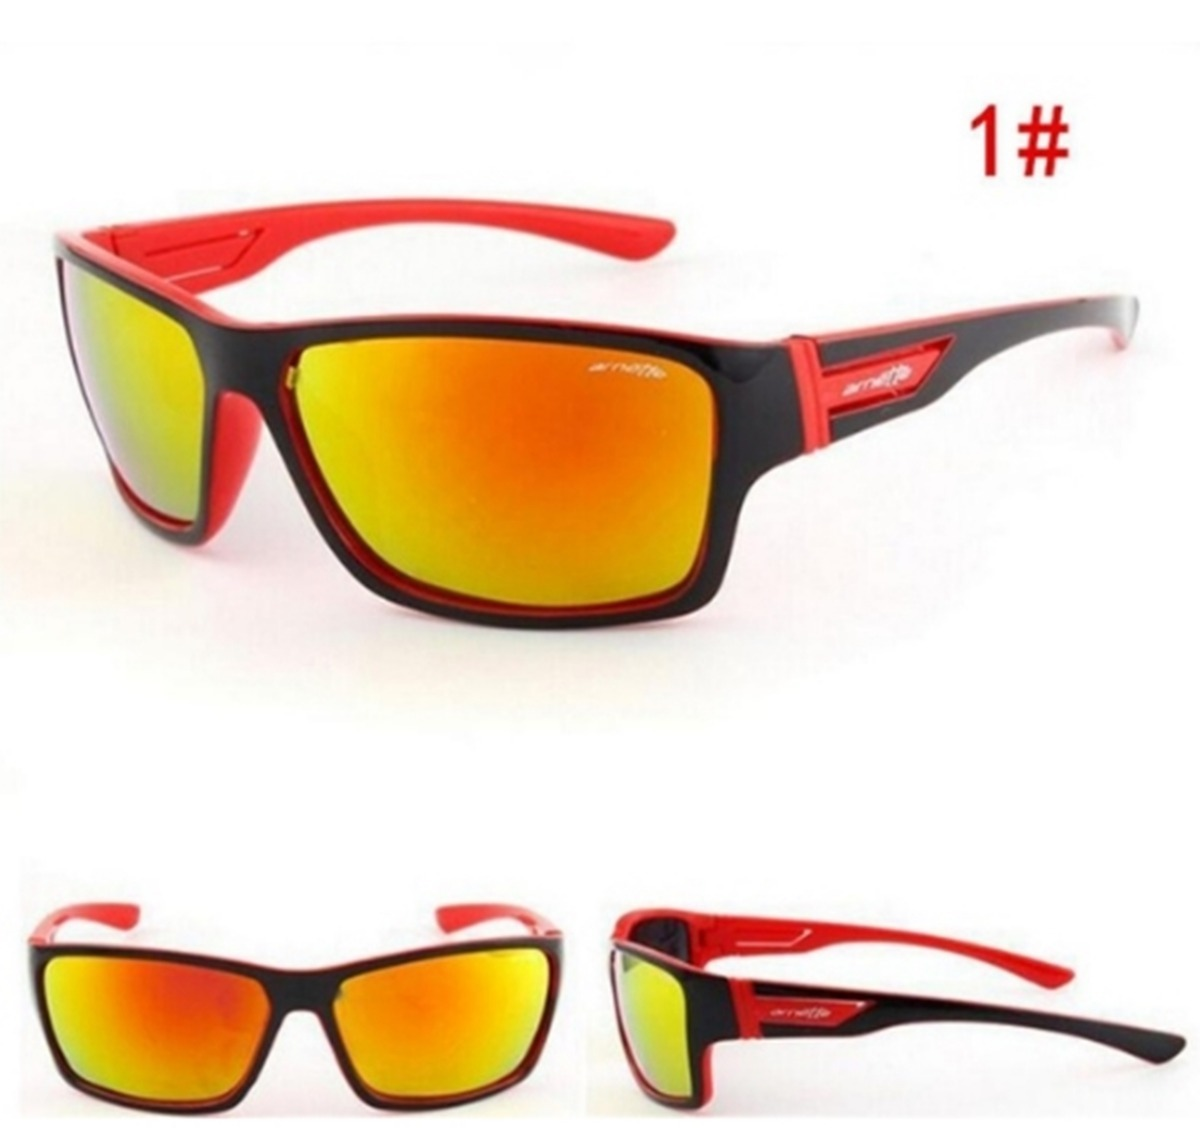 14d918aac93fe óculos de sol masculino arnette proteção uv400 barato. Carregando zoom.